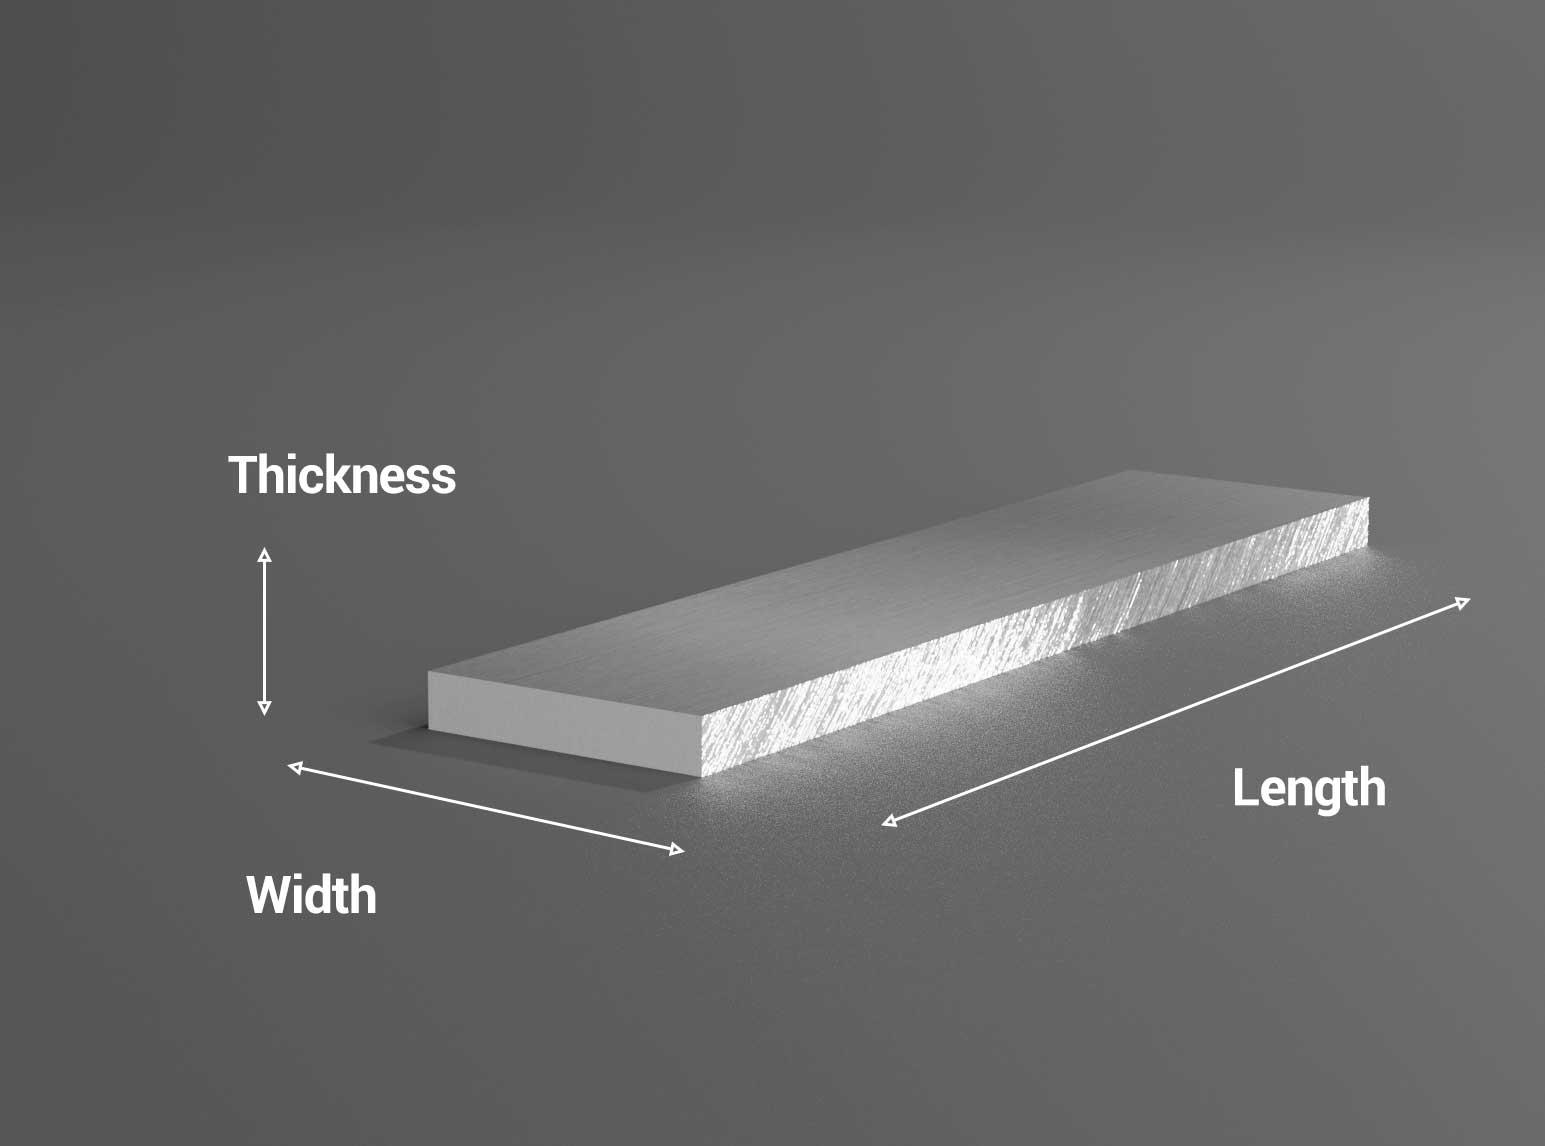 Weight_calculation_formula_aluminium_tread_plate